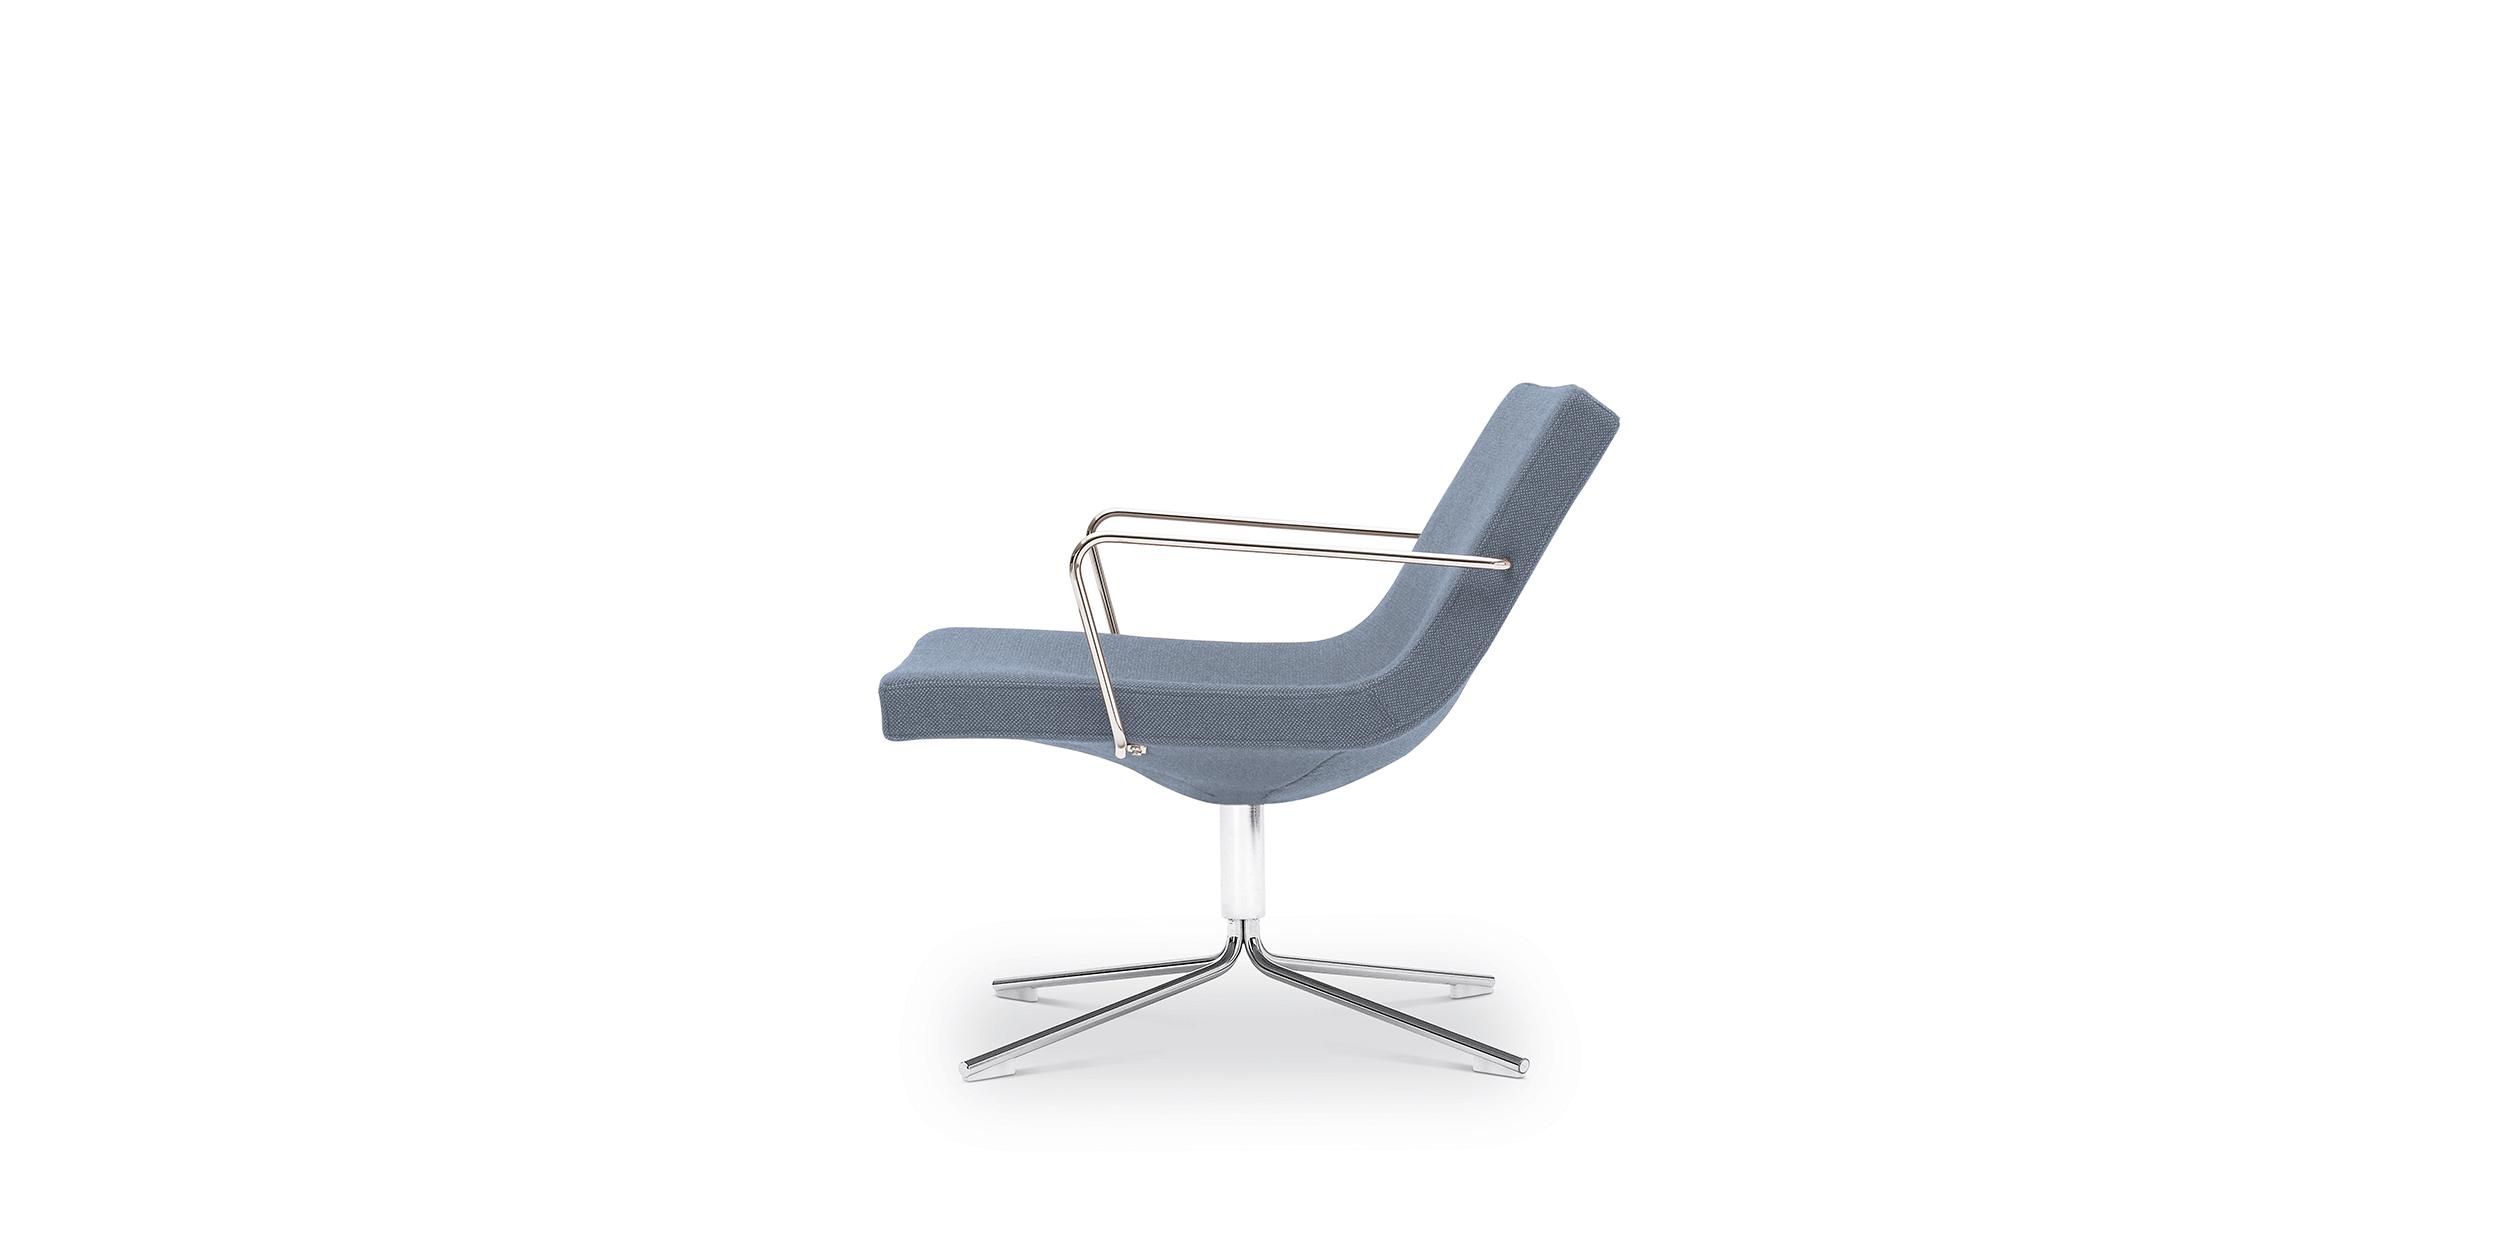 Popular Bond Easy Armchair Modern Design Jean Marie Massaud Offecct Chairs Inside Mari Swivel Glider Recliners (View 20 of 20)